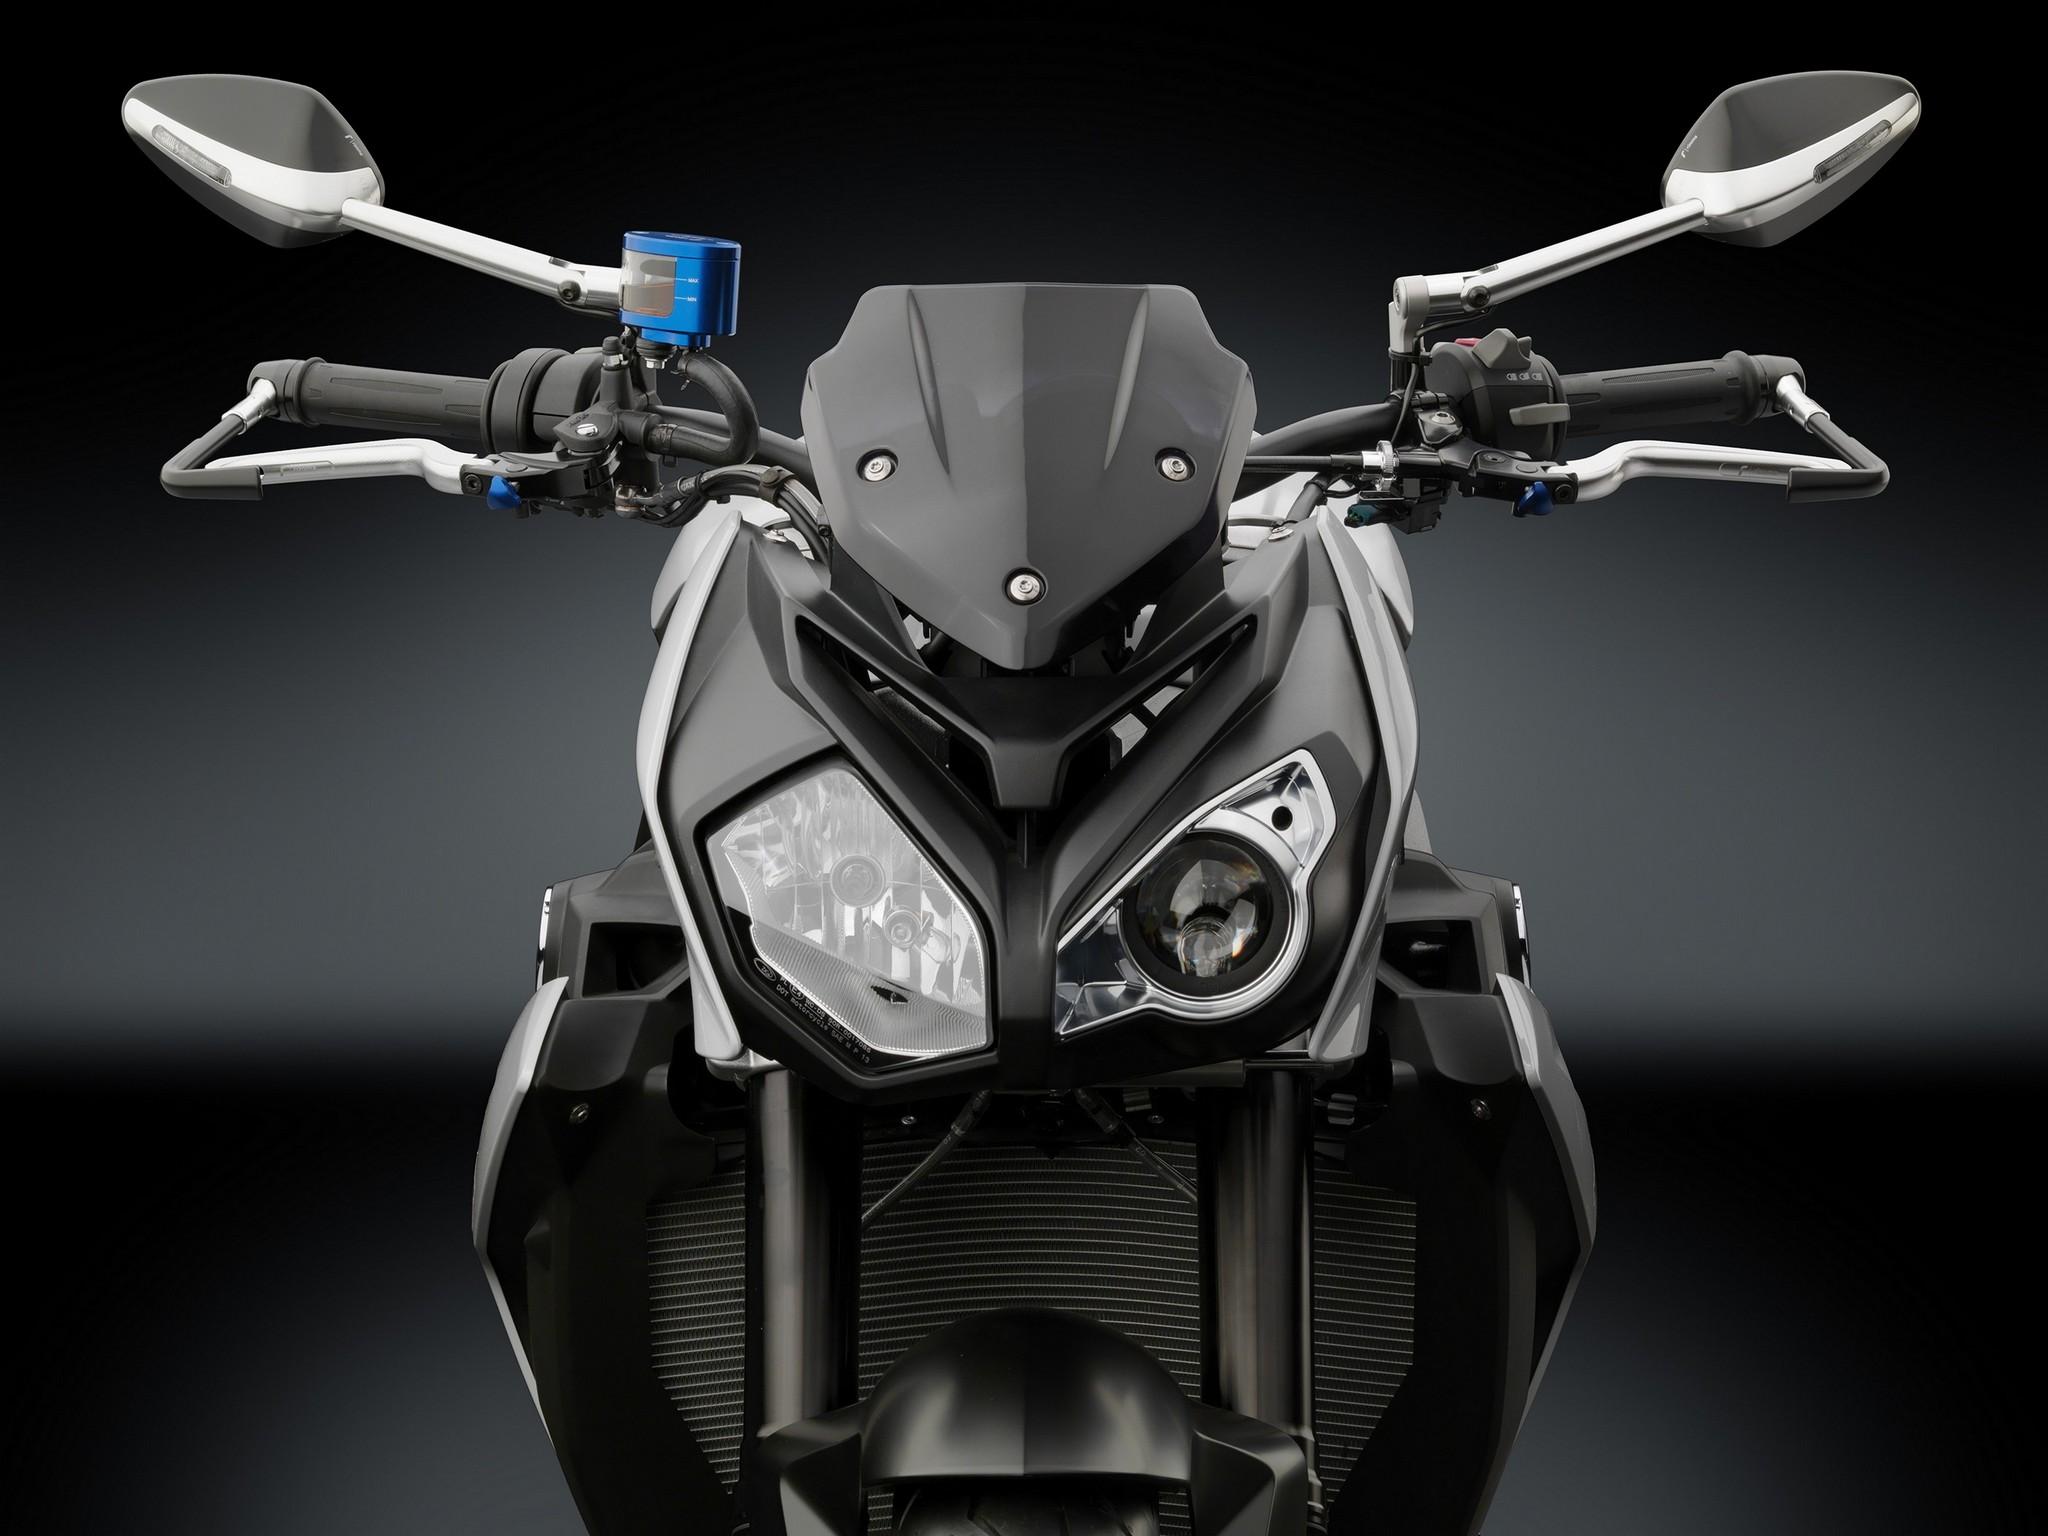 Bmw s1000r receives rizoma upgrades autoevolution